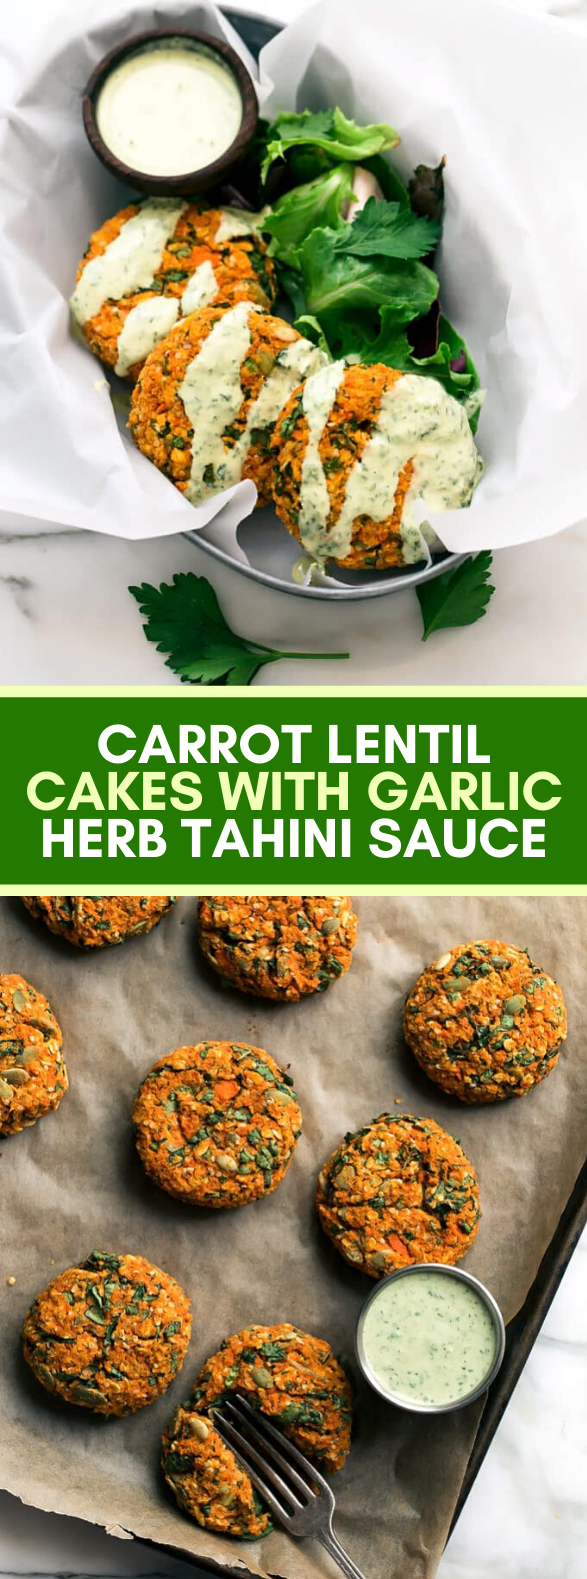 CARROT-LENTIL CAKES WITH GARLIC-HERB TAHINI SAUCE #vegan #glutenfree